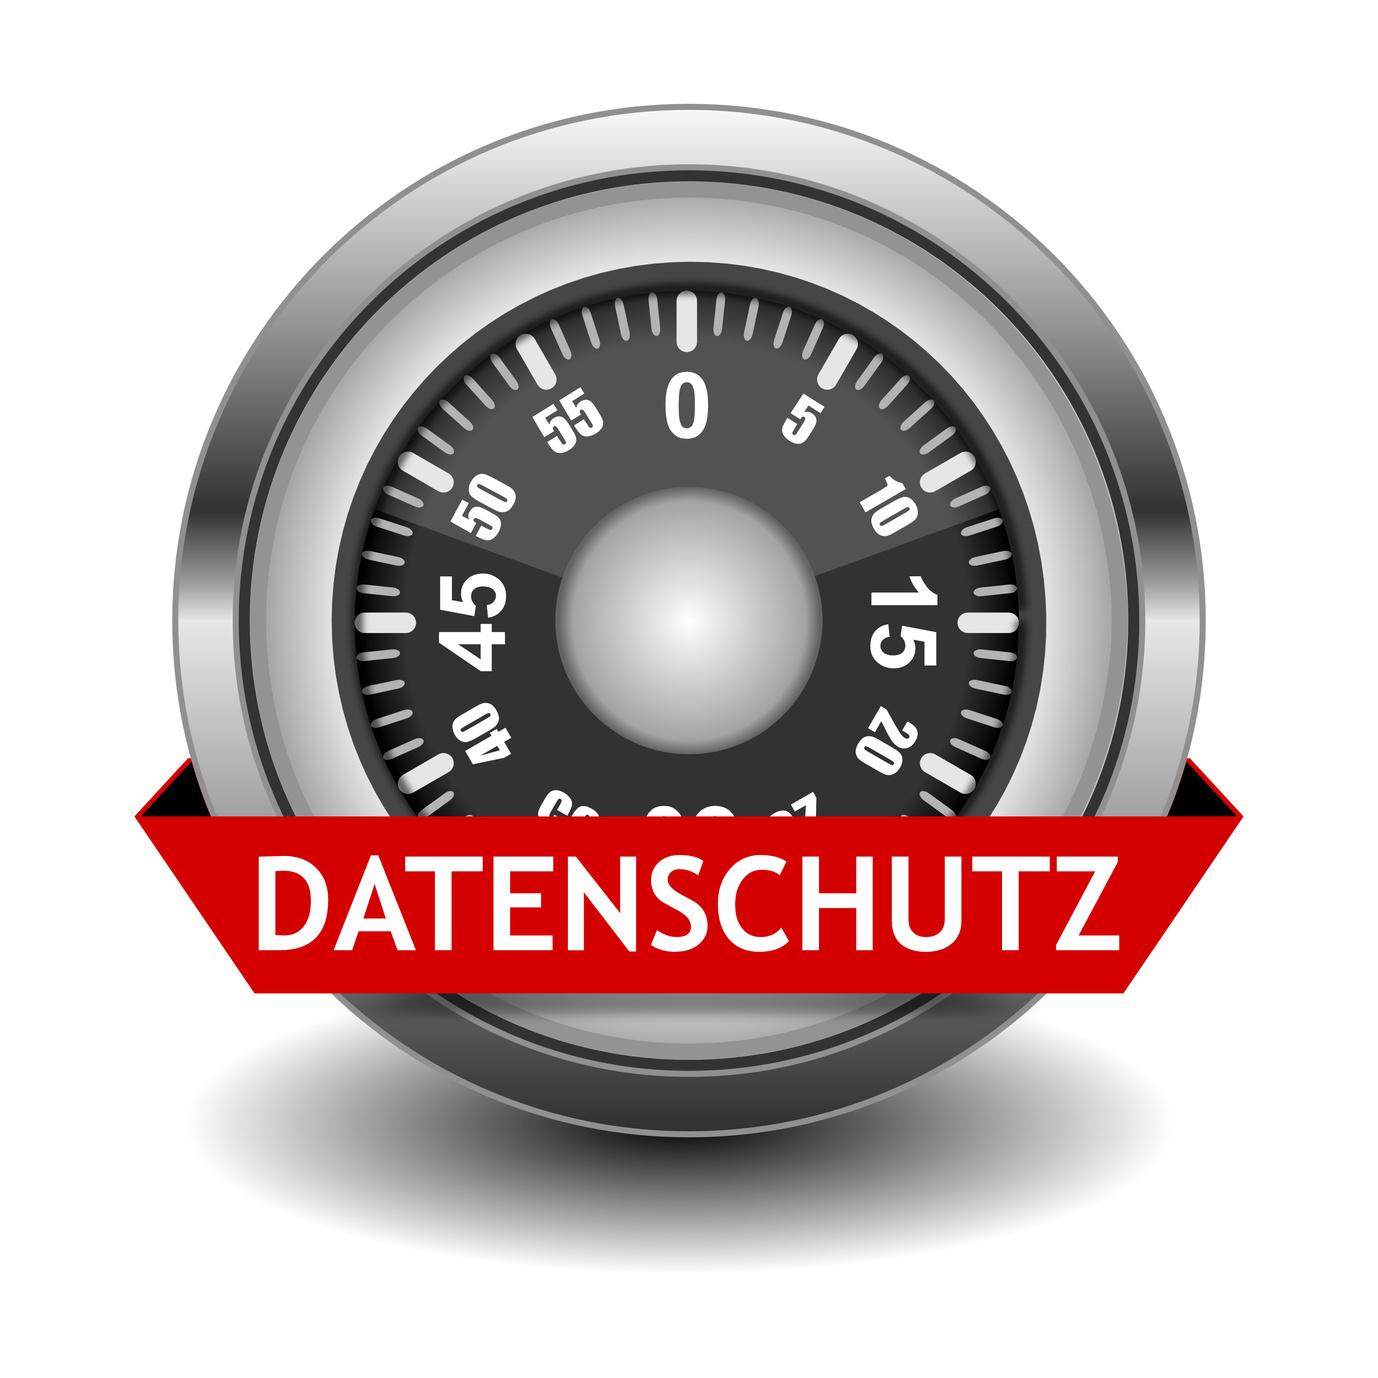 https://www.ztg-nrw.de/wp-content/uploads/2017/05/Datenschutz.jpg